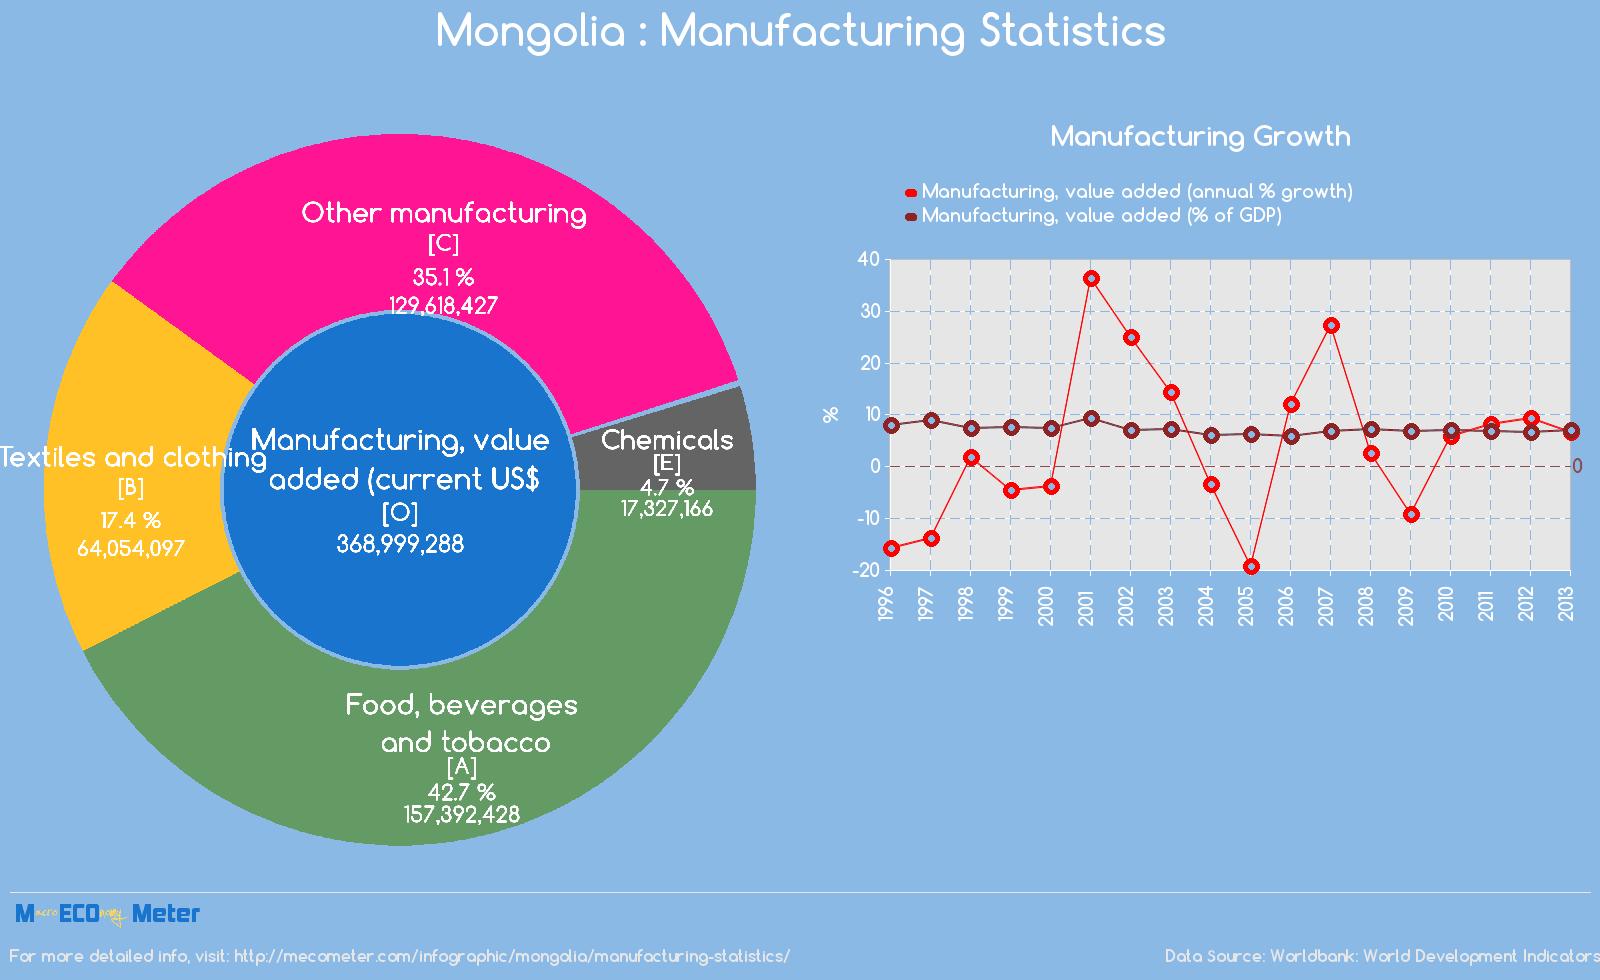 Mongolia : Manufacturing Statistics